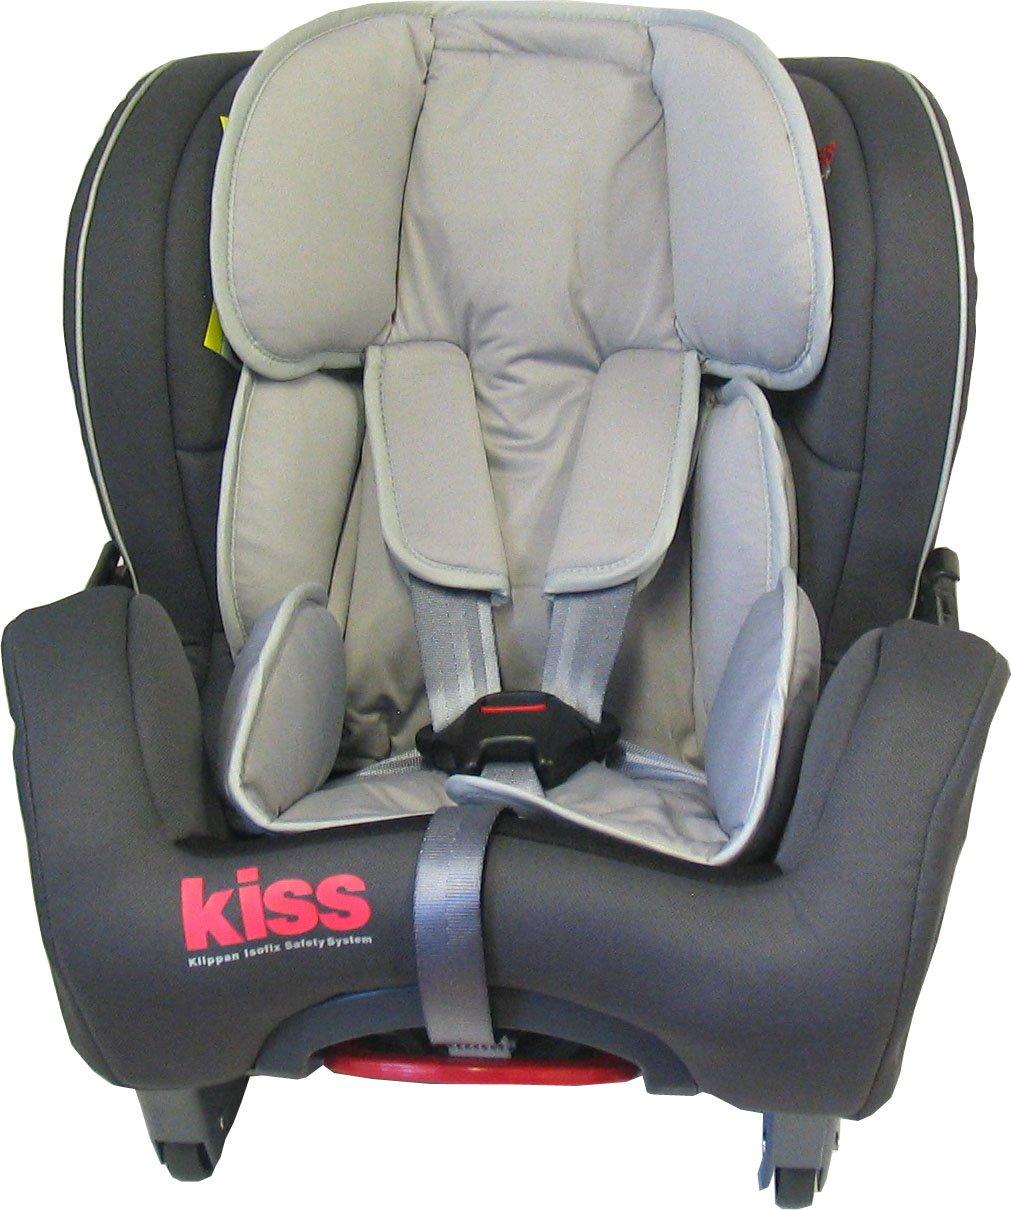 reductor silla grupo 0-1 Kiss 2 Plus, de Klippan